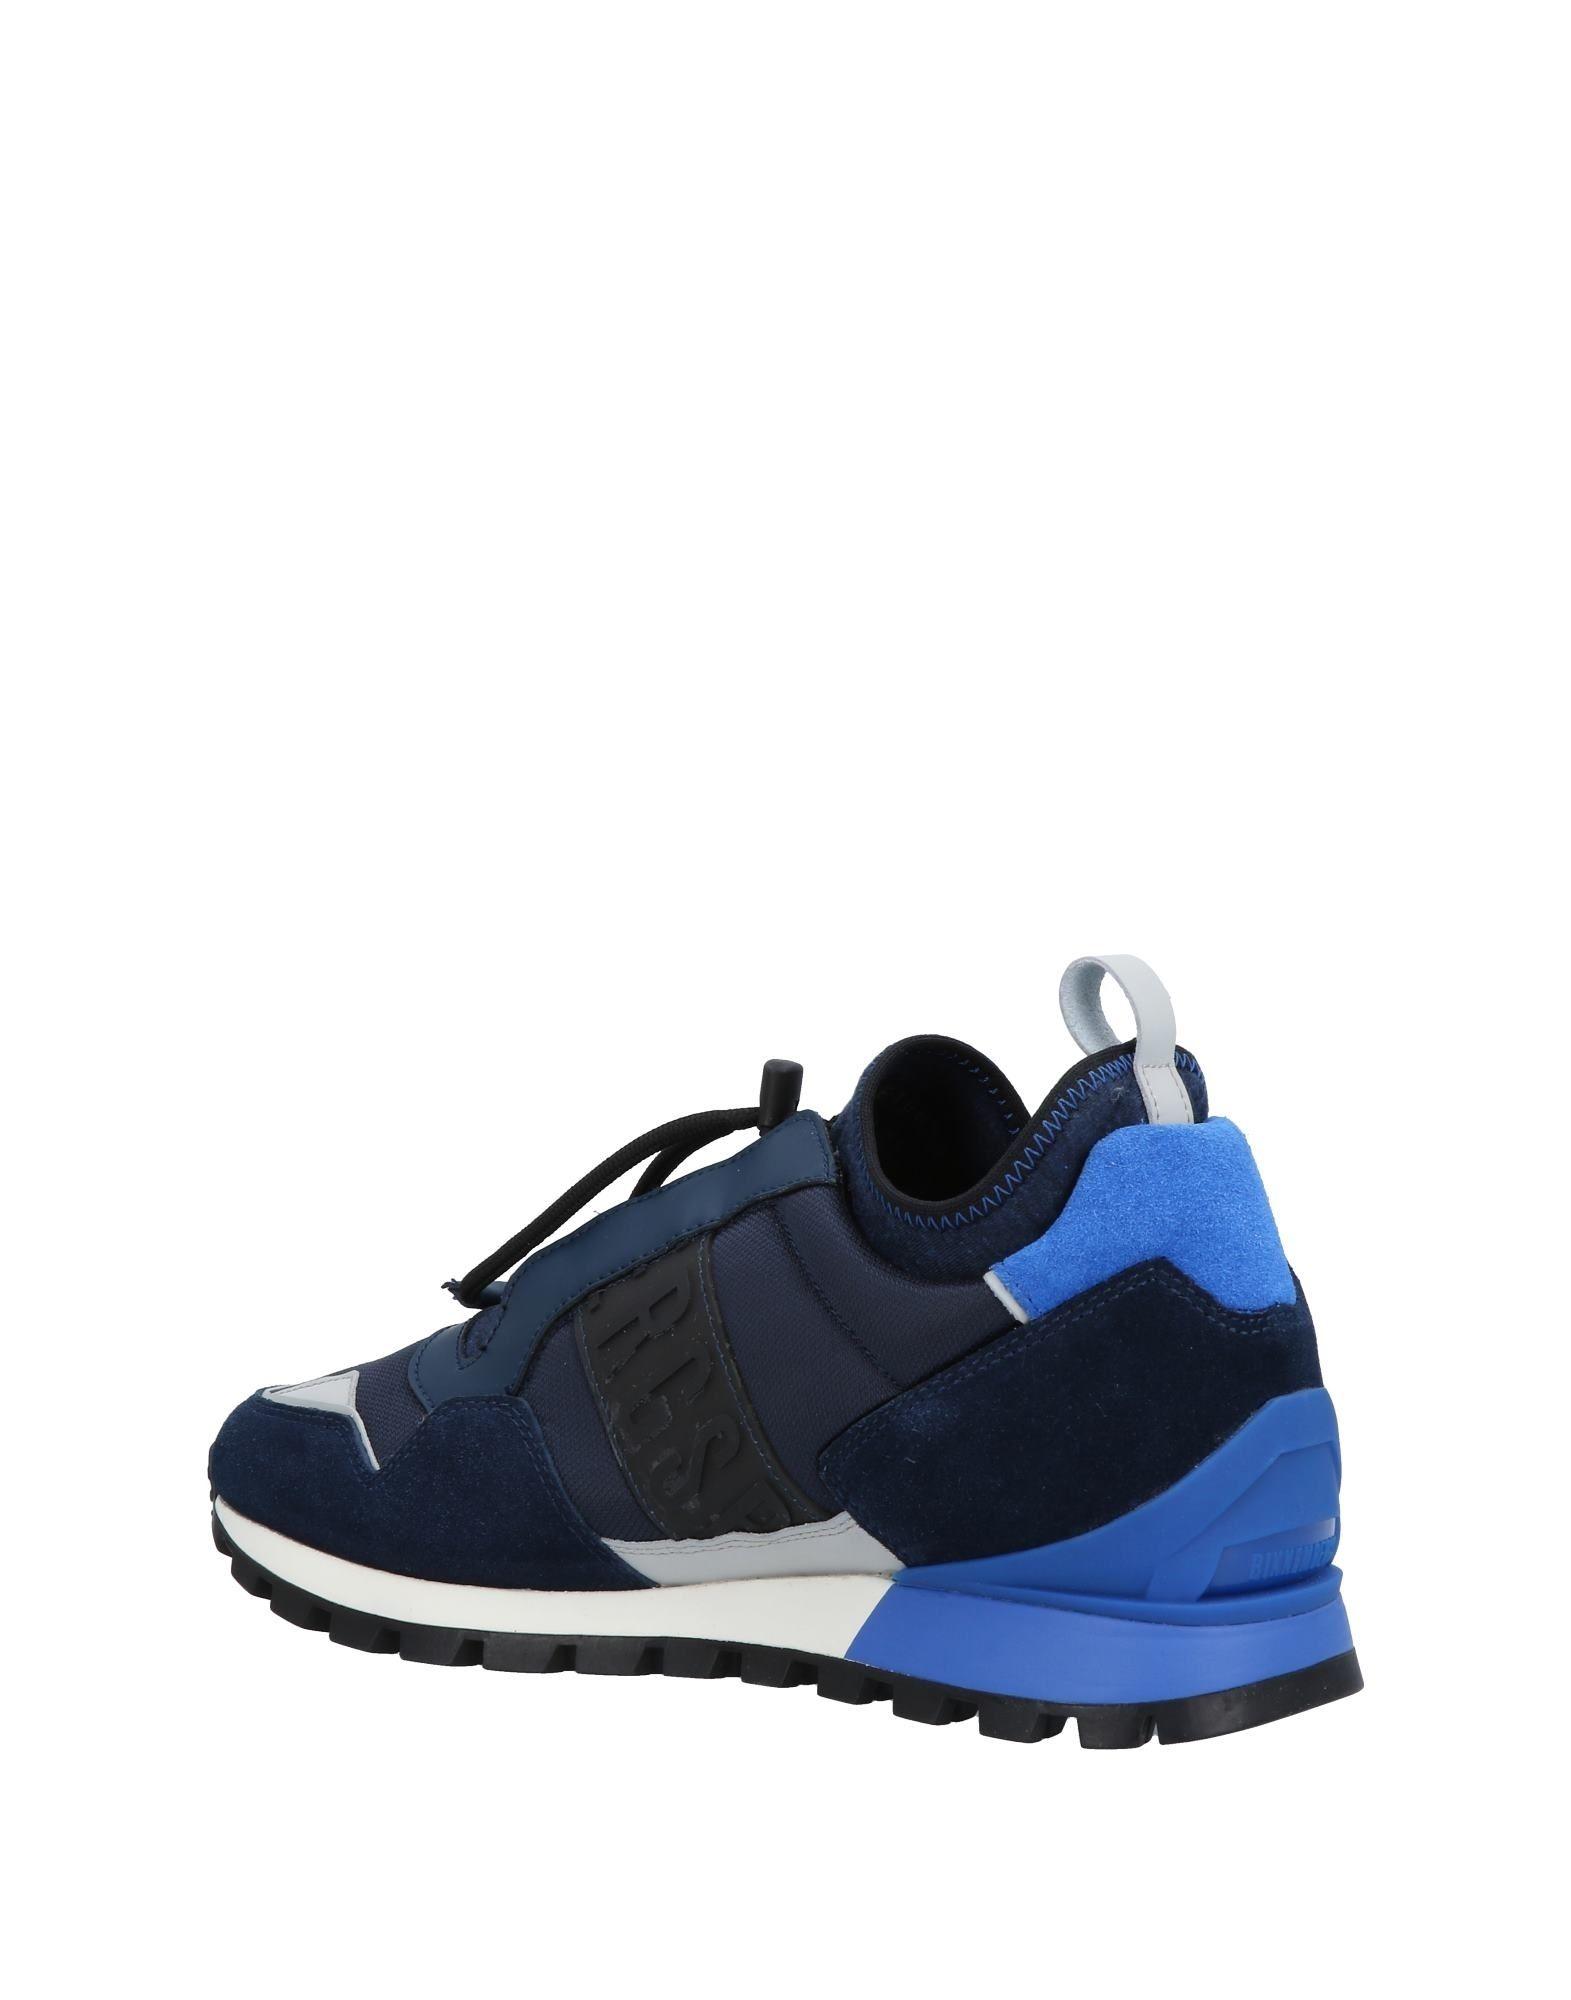 Bikkembergs 11449957CX Sneakers Herren  11449957CX Bikkembergs f60467